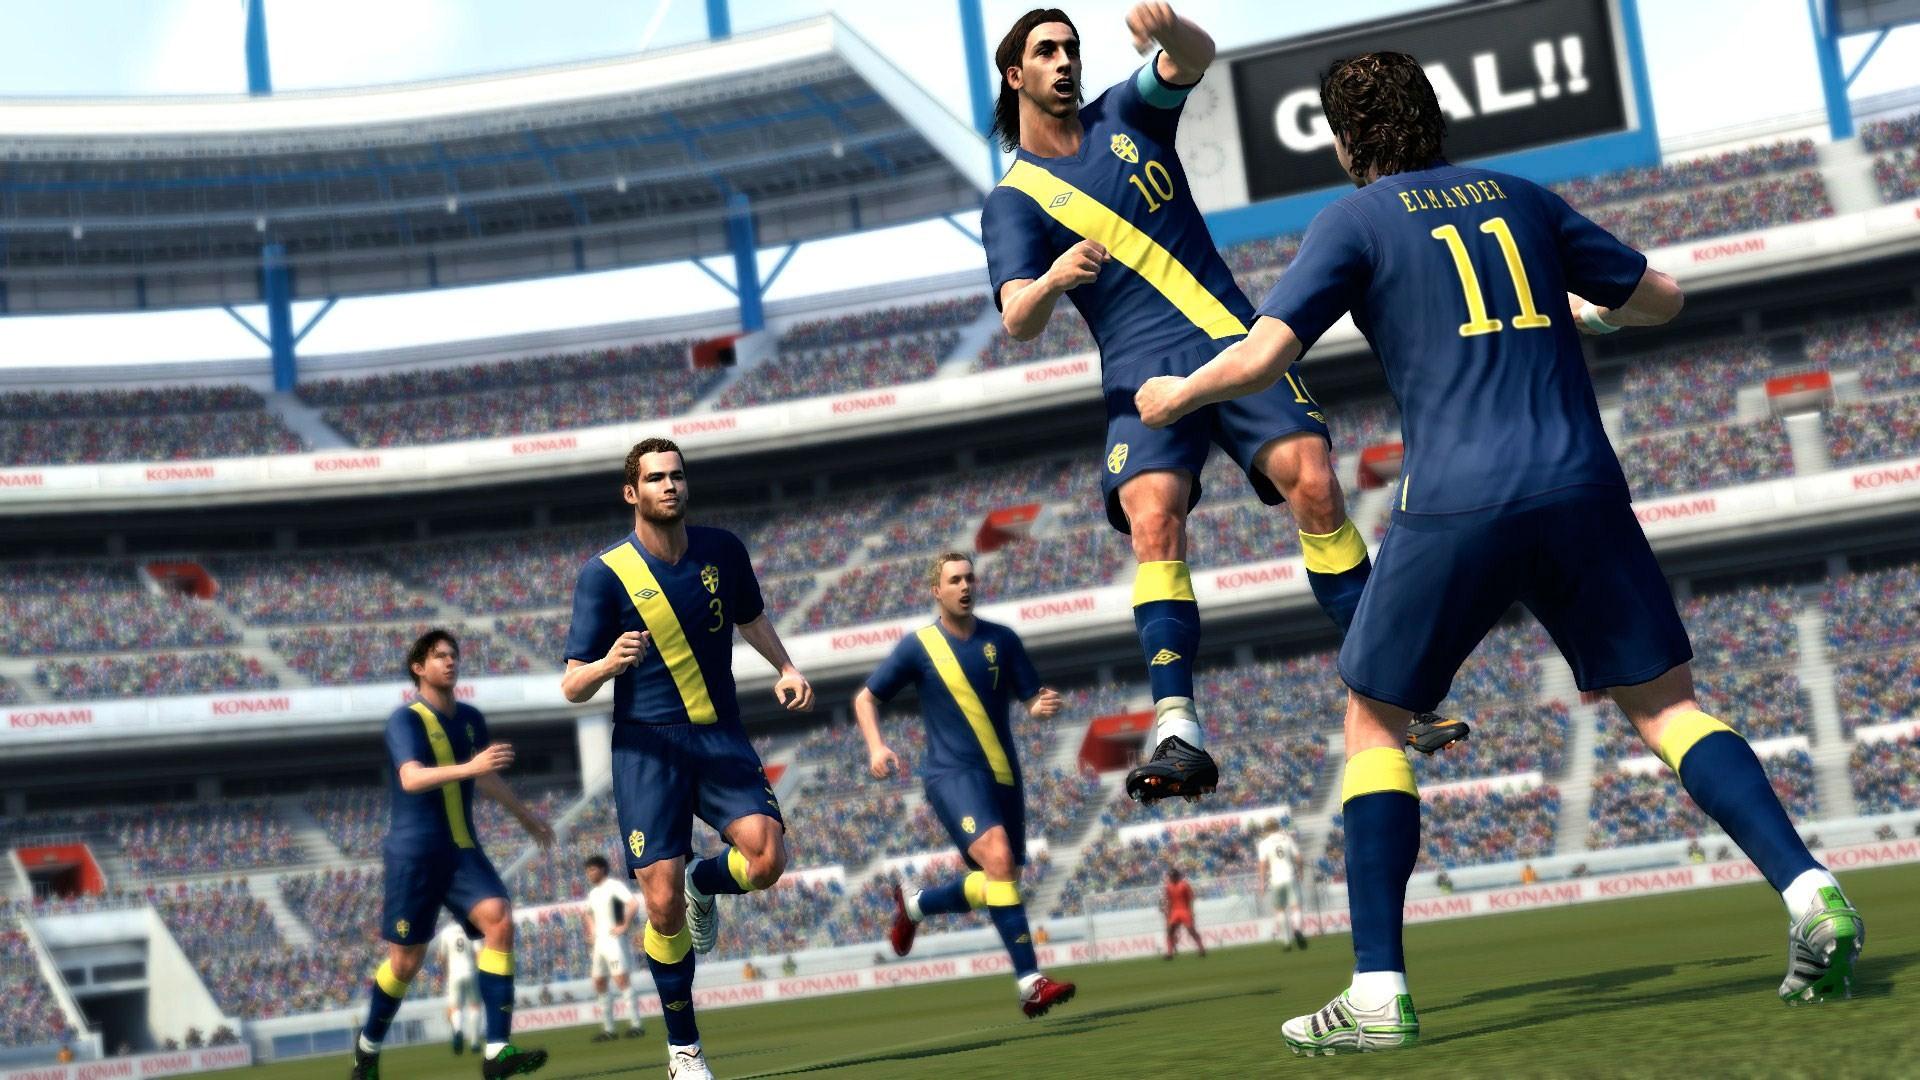 Pro Evolution Soccer 2011 - DLC ufficiale